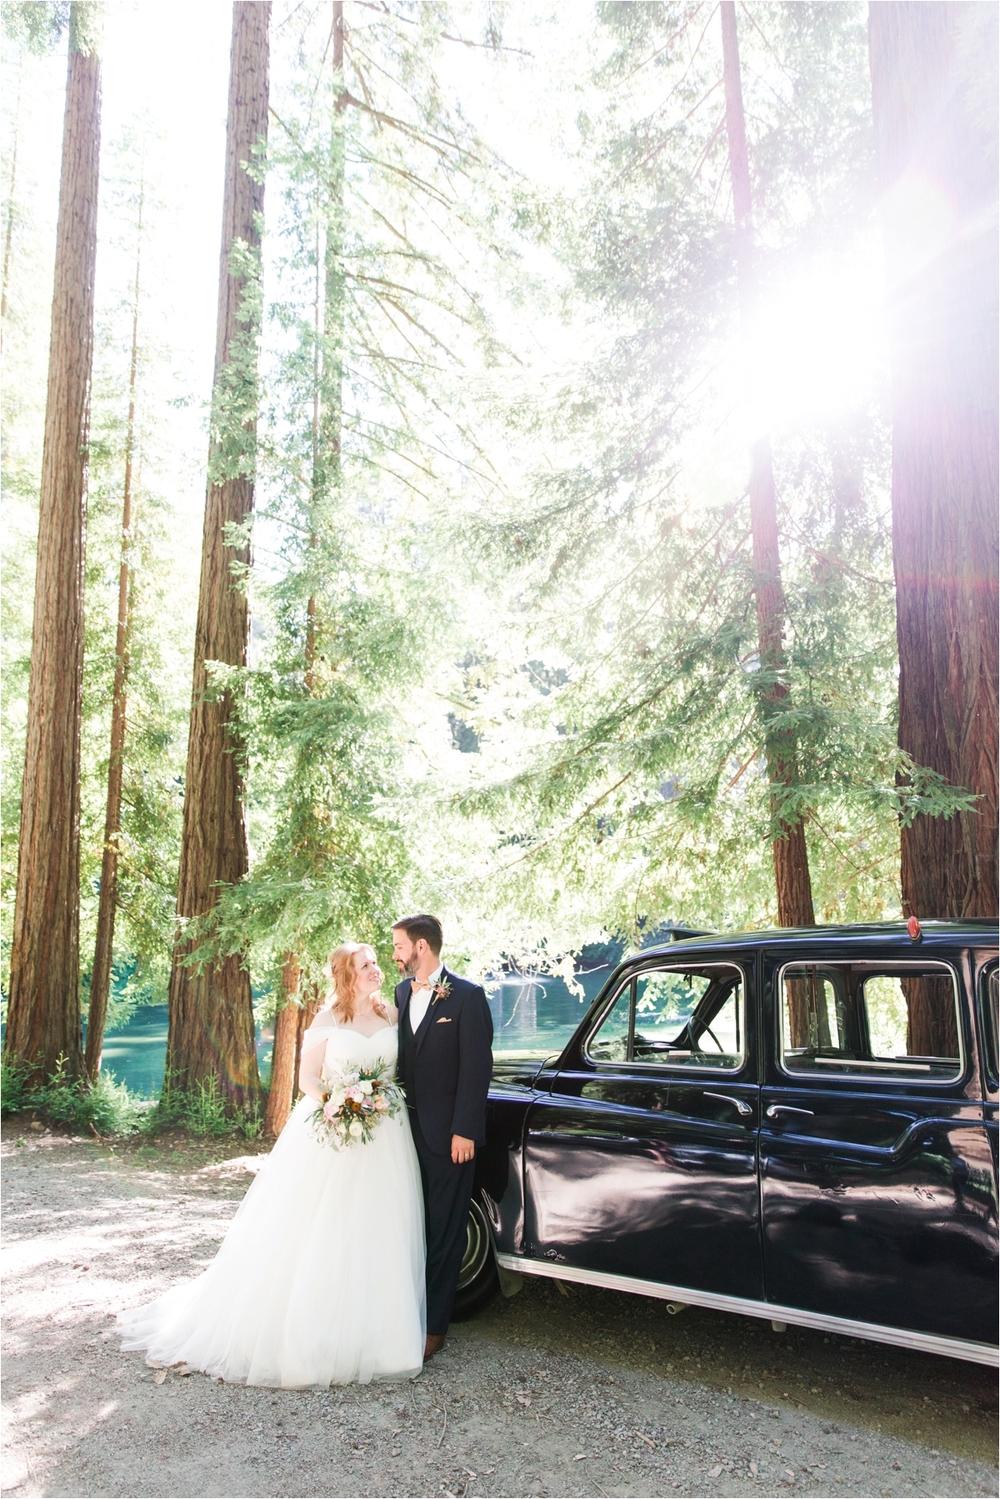 Nestldown wedding Photos by Briana Calderon Photography_0149.jpg